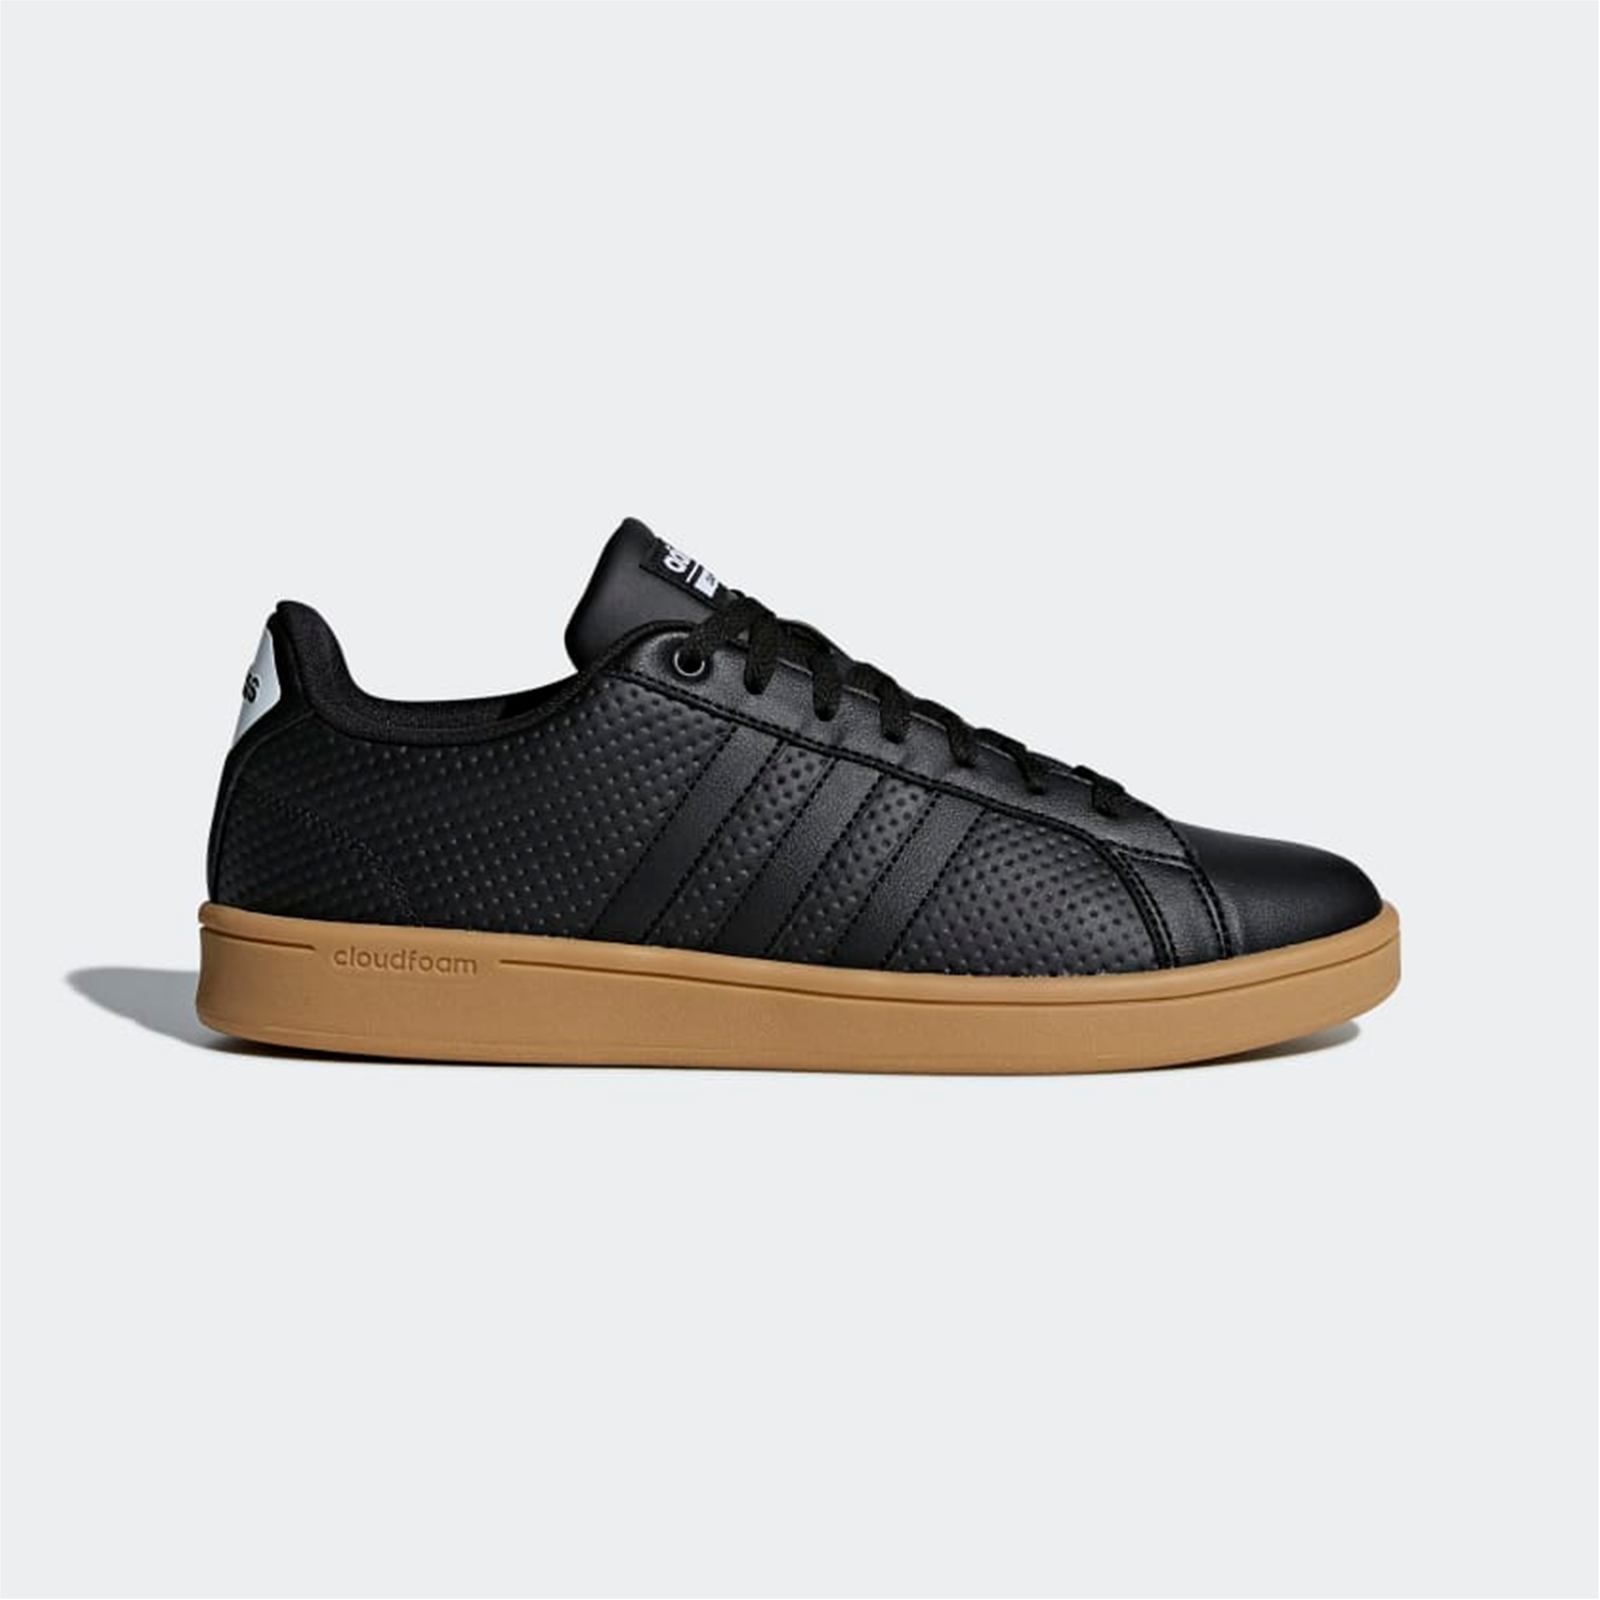 ed6e06557b5 ADIDAS NEO CF ADVANTAGE sneakers black GUM GUM GUM shoes men CASUAL  cloudfoam B43668 9dd22b